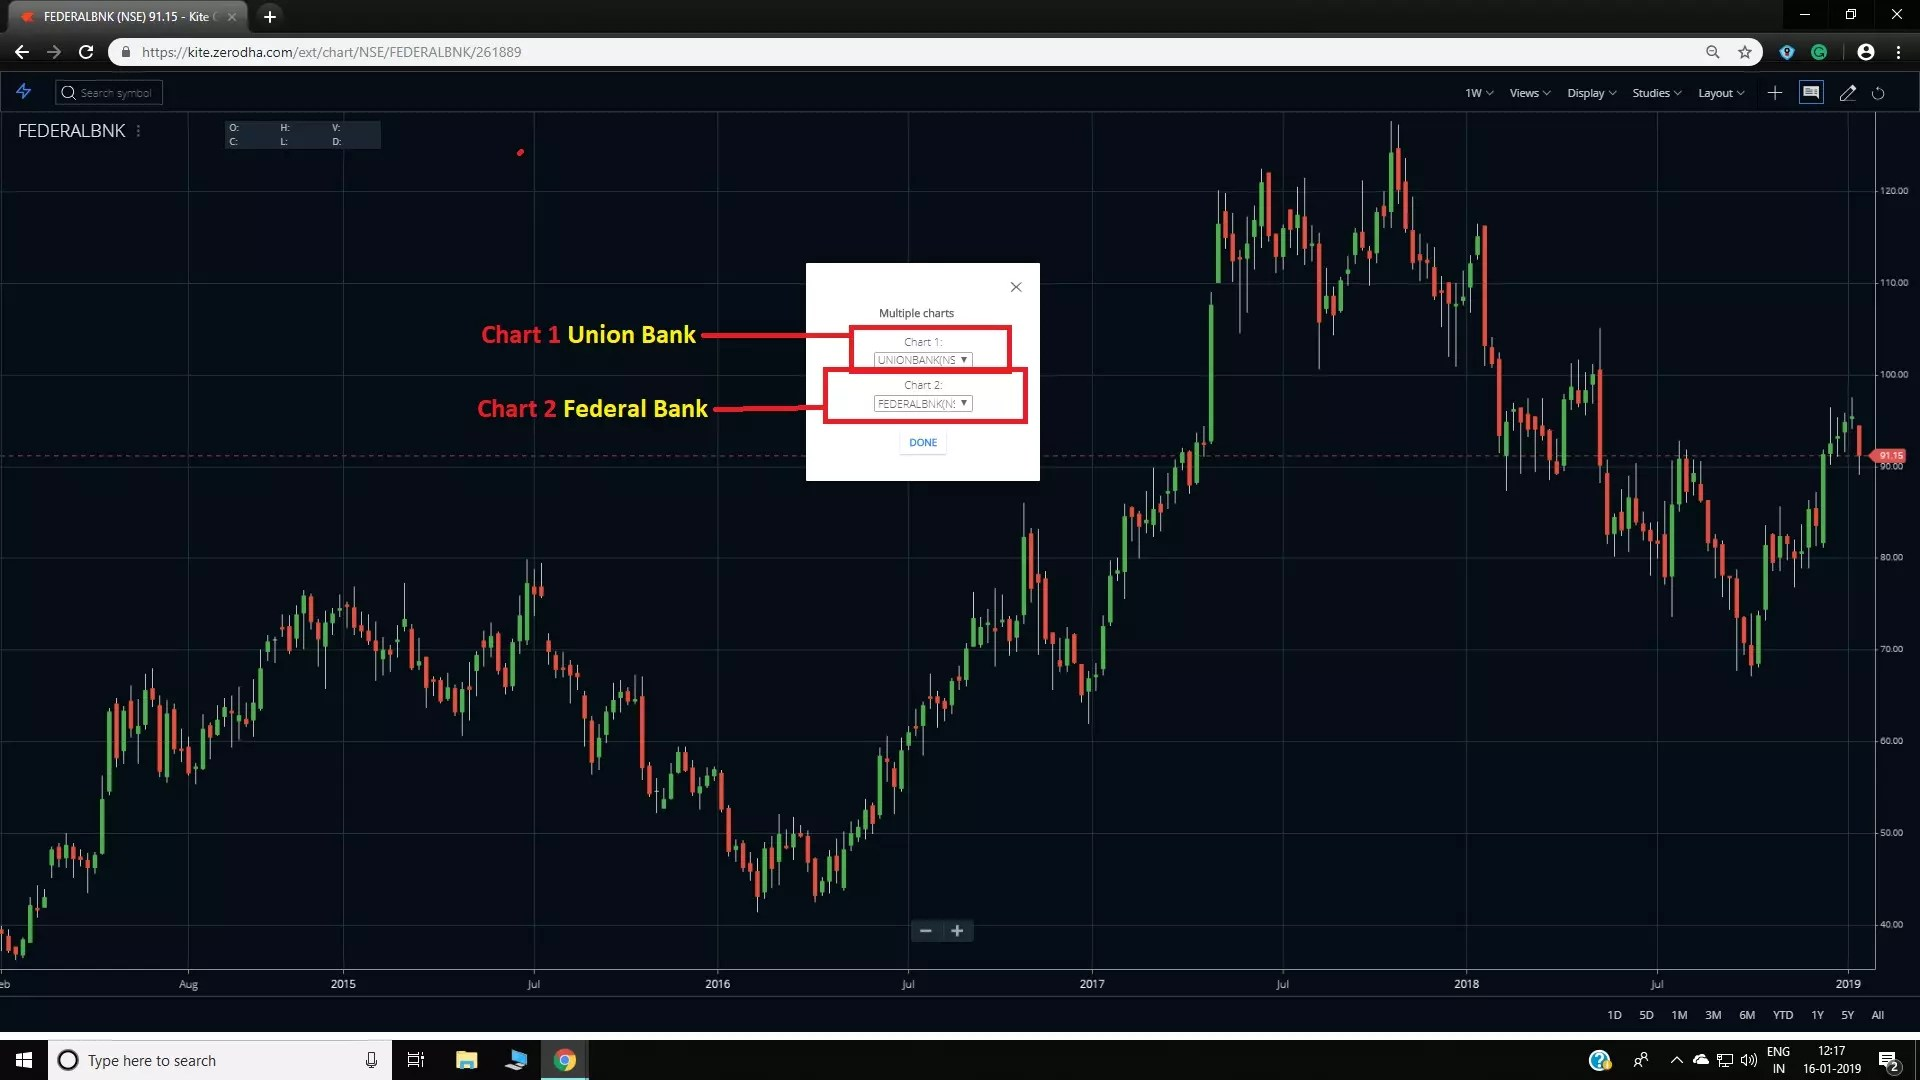 multiple charts window